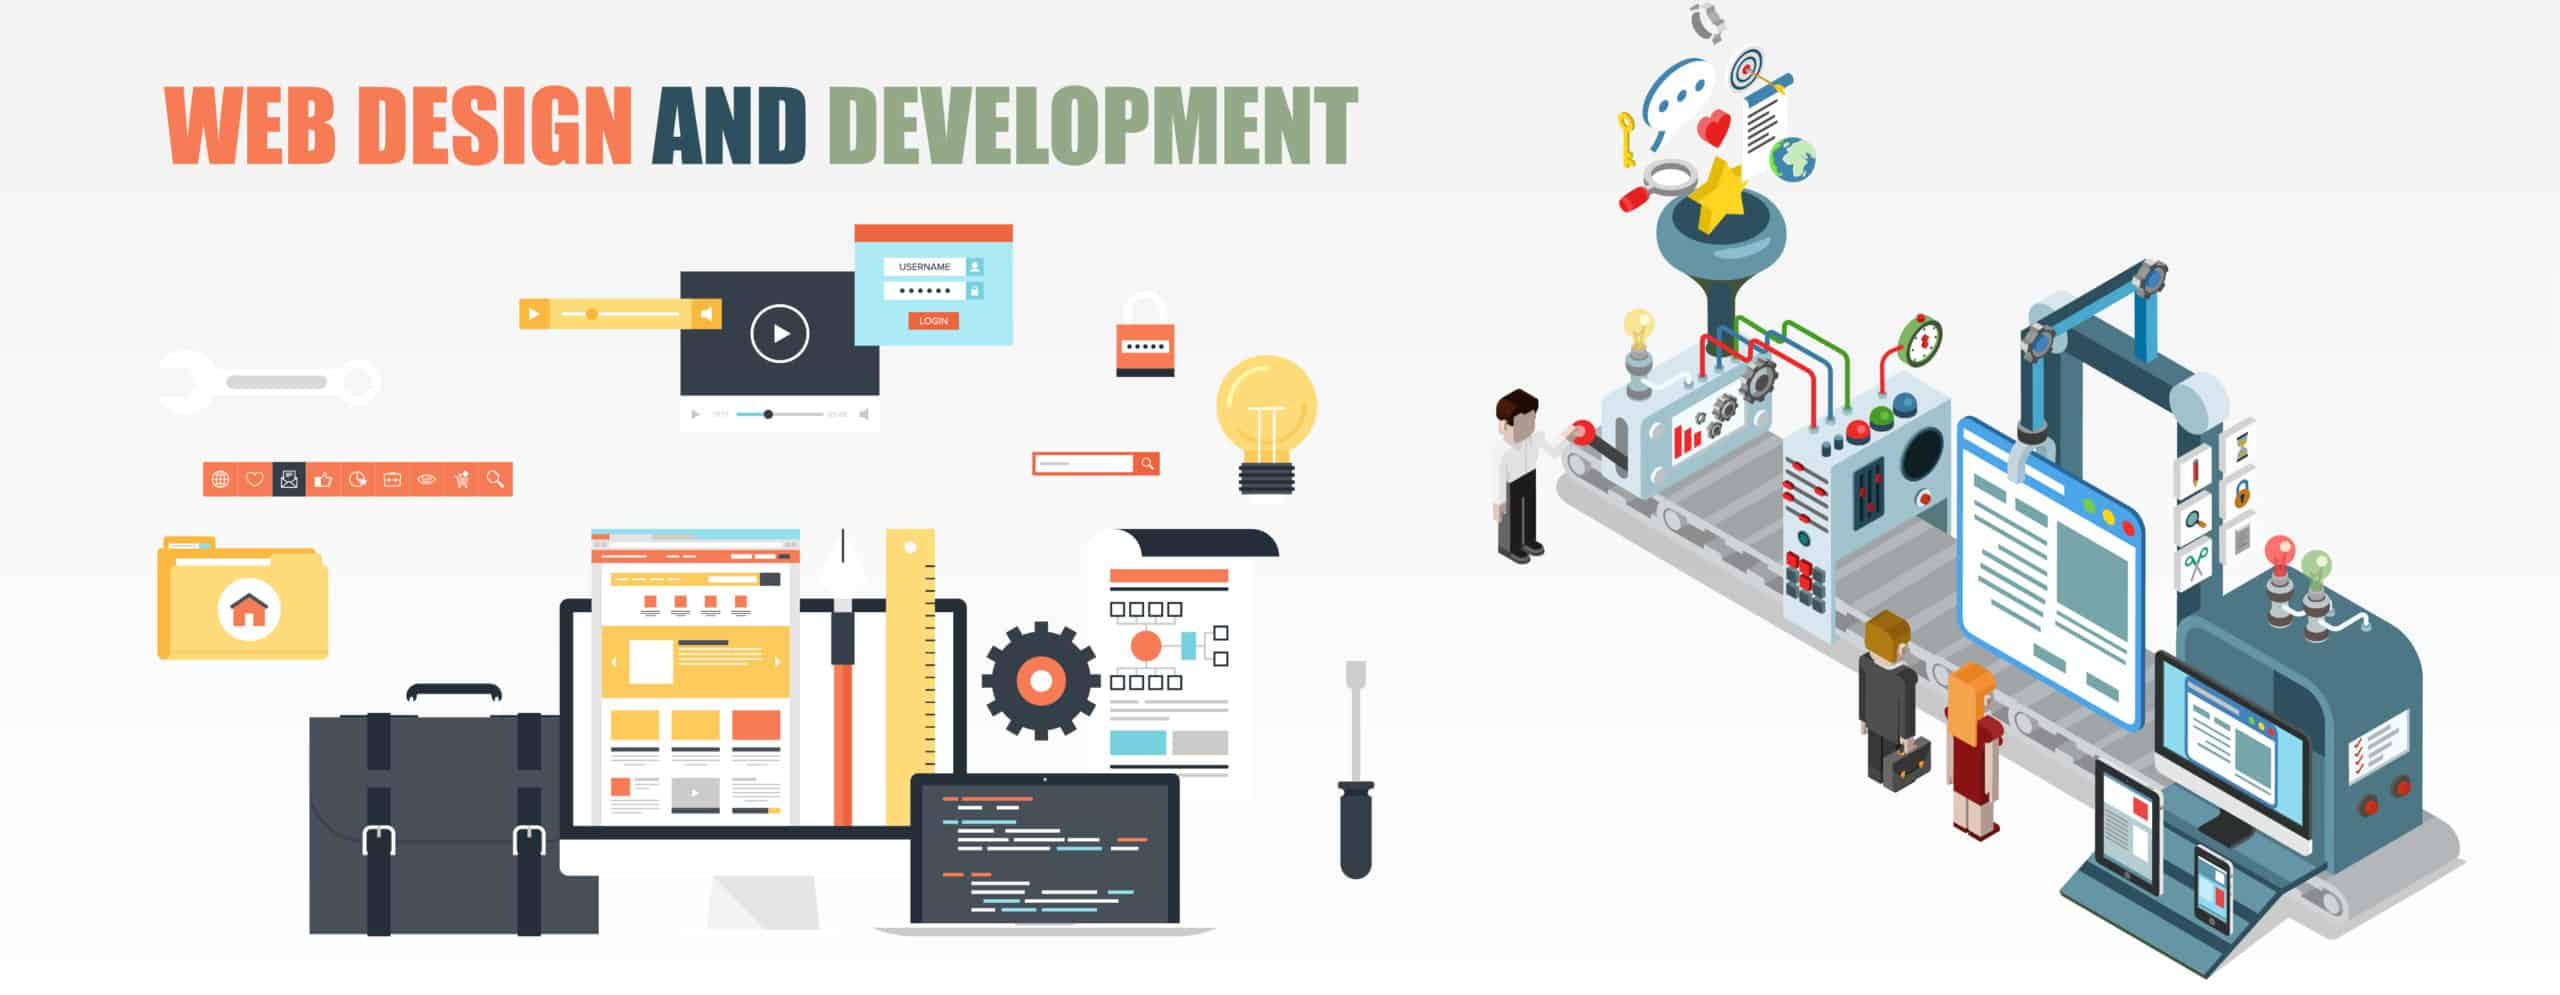 Web Design and Development Service=